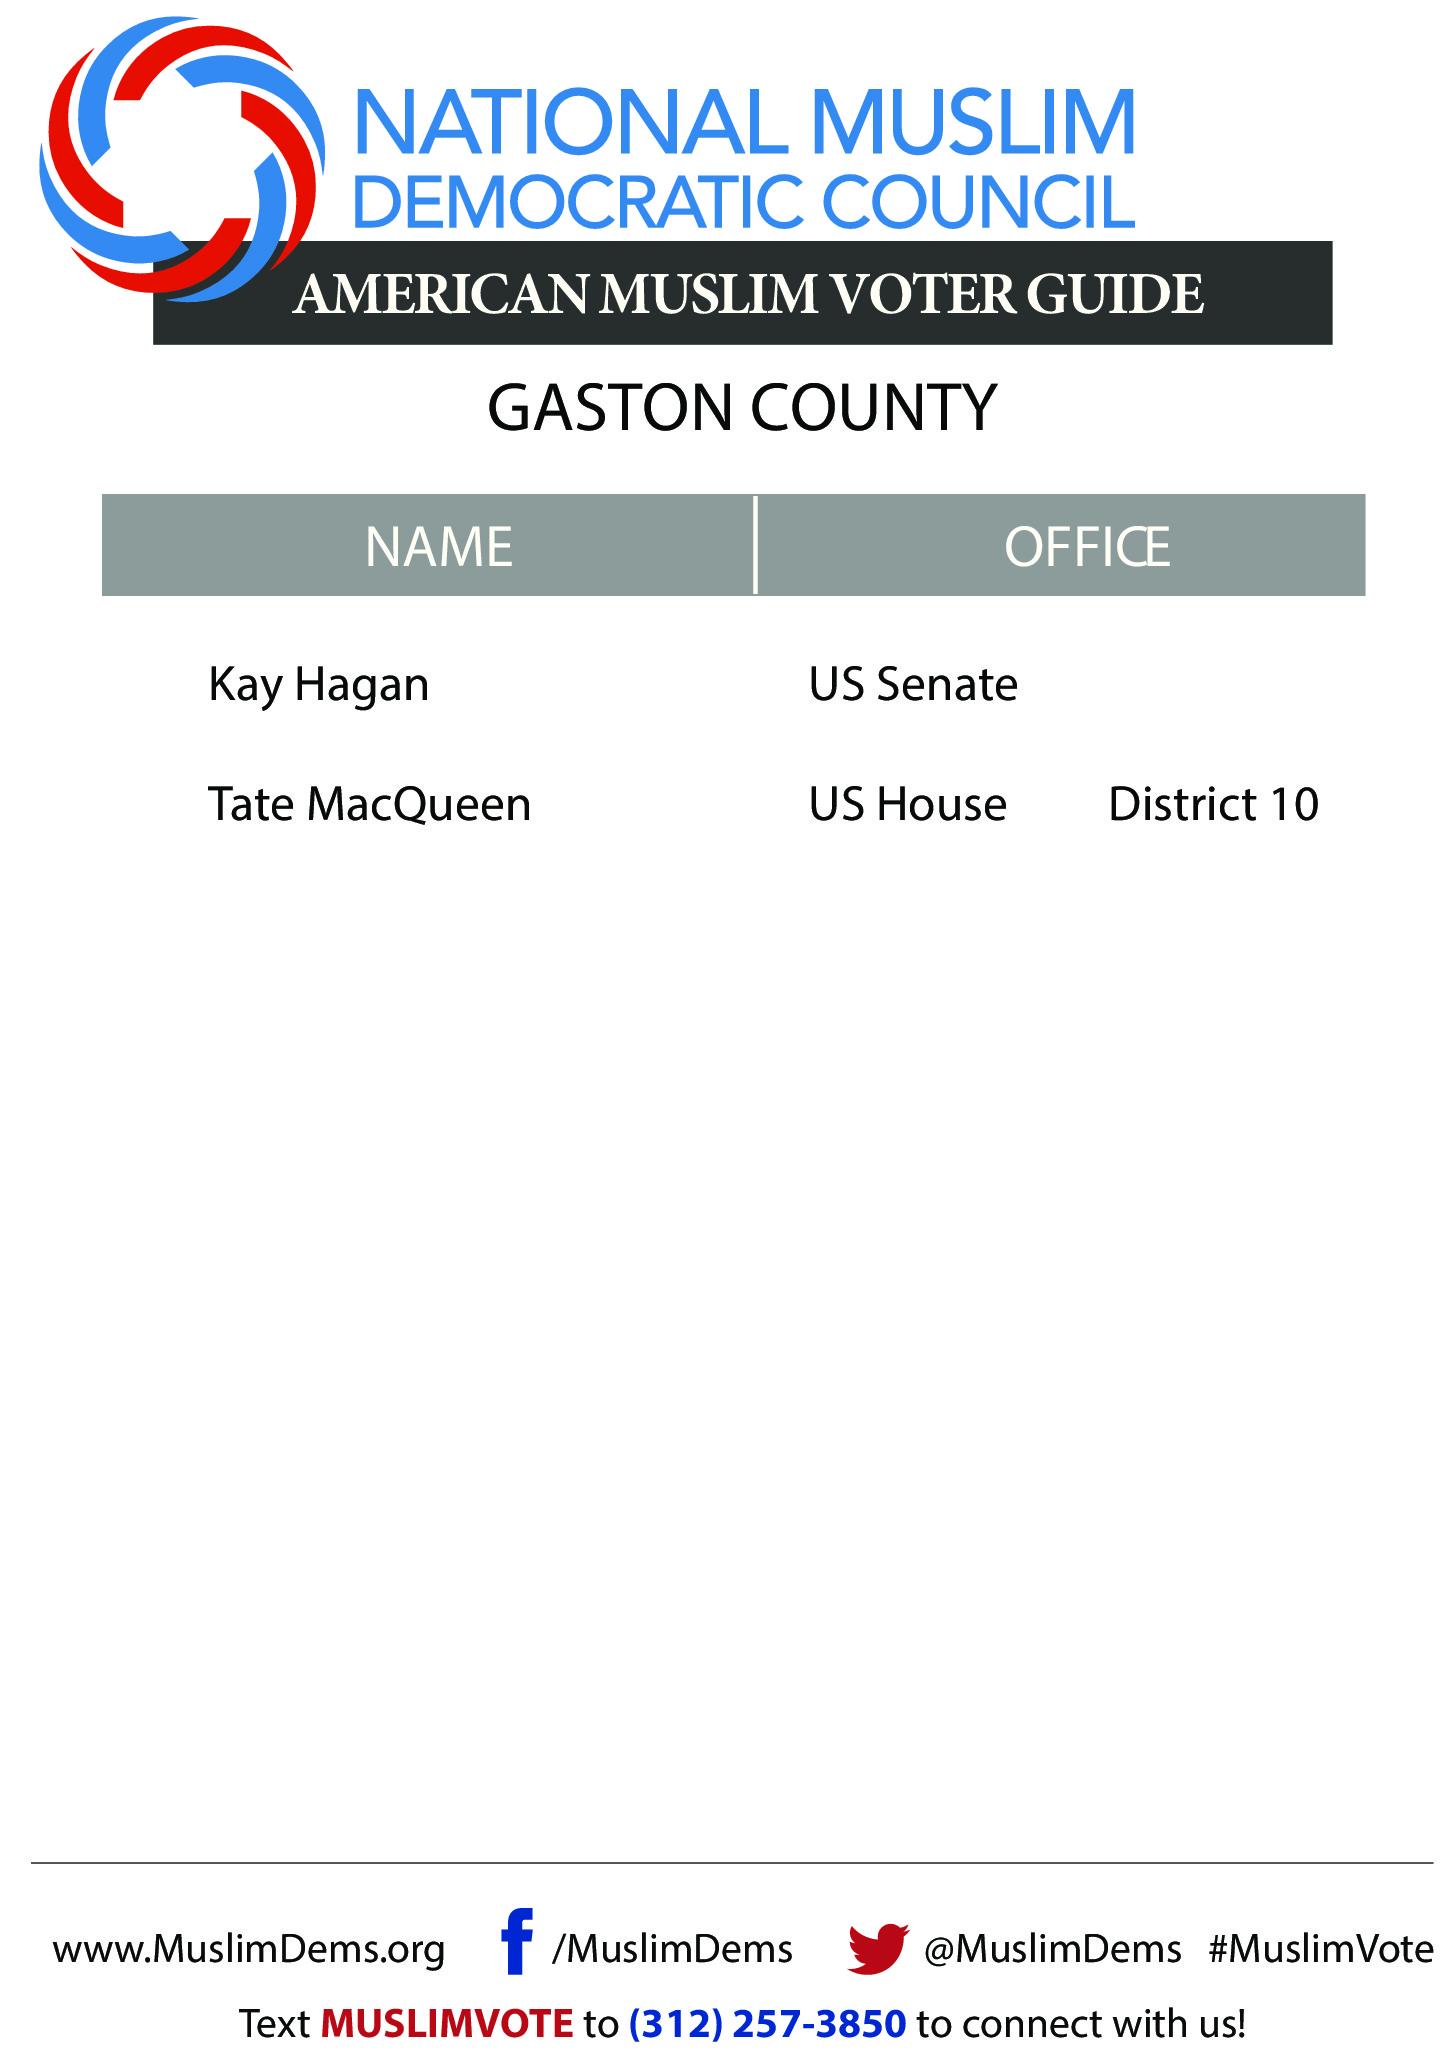 GastonCLT_NC_2014-page-0.jpg